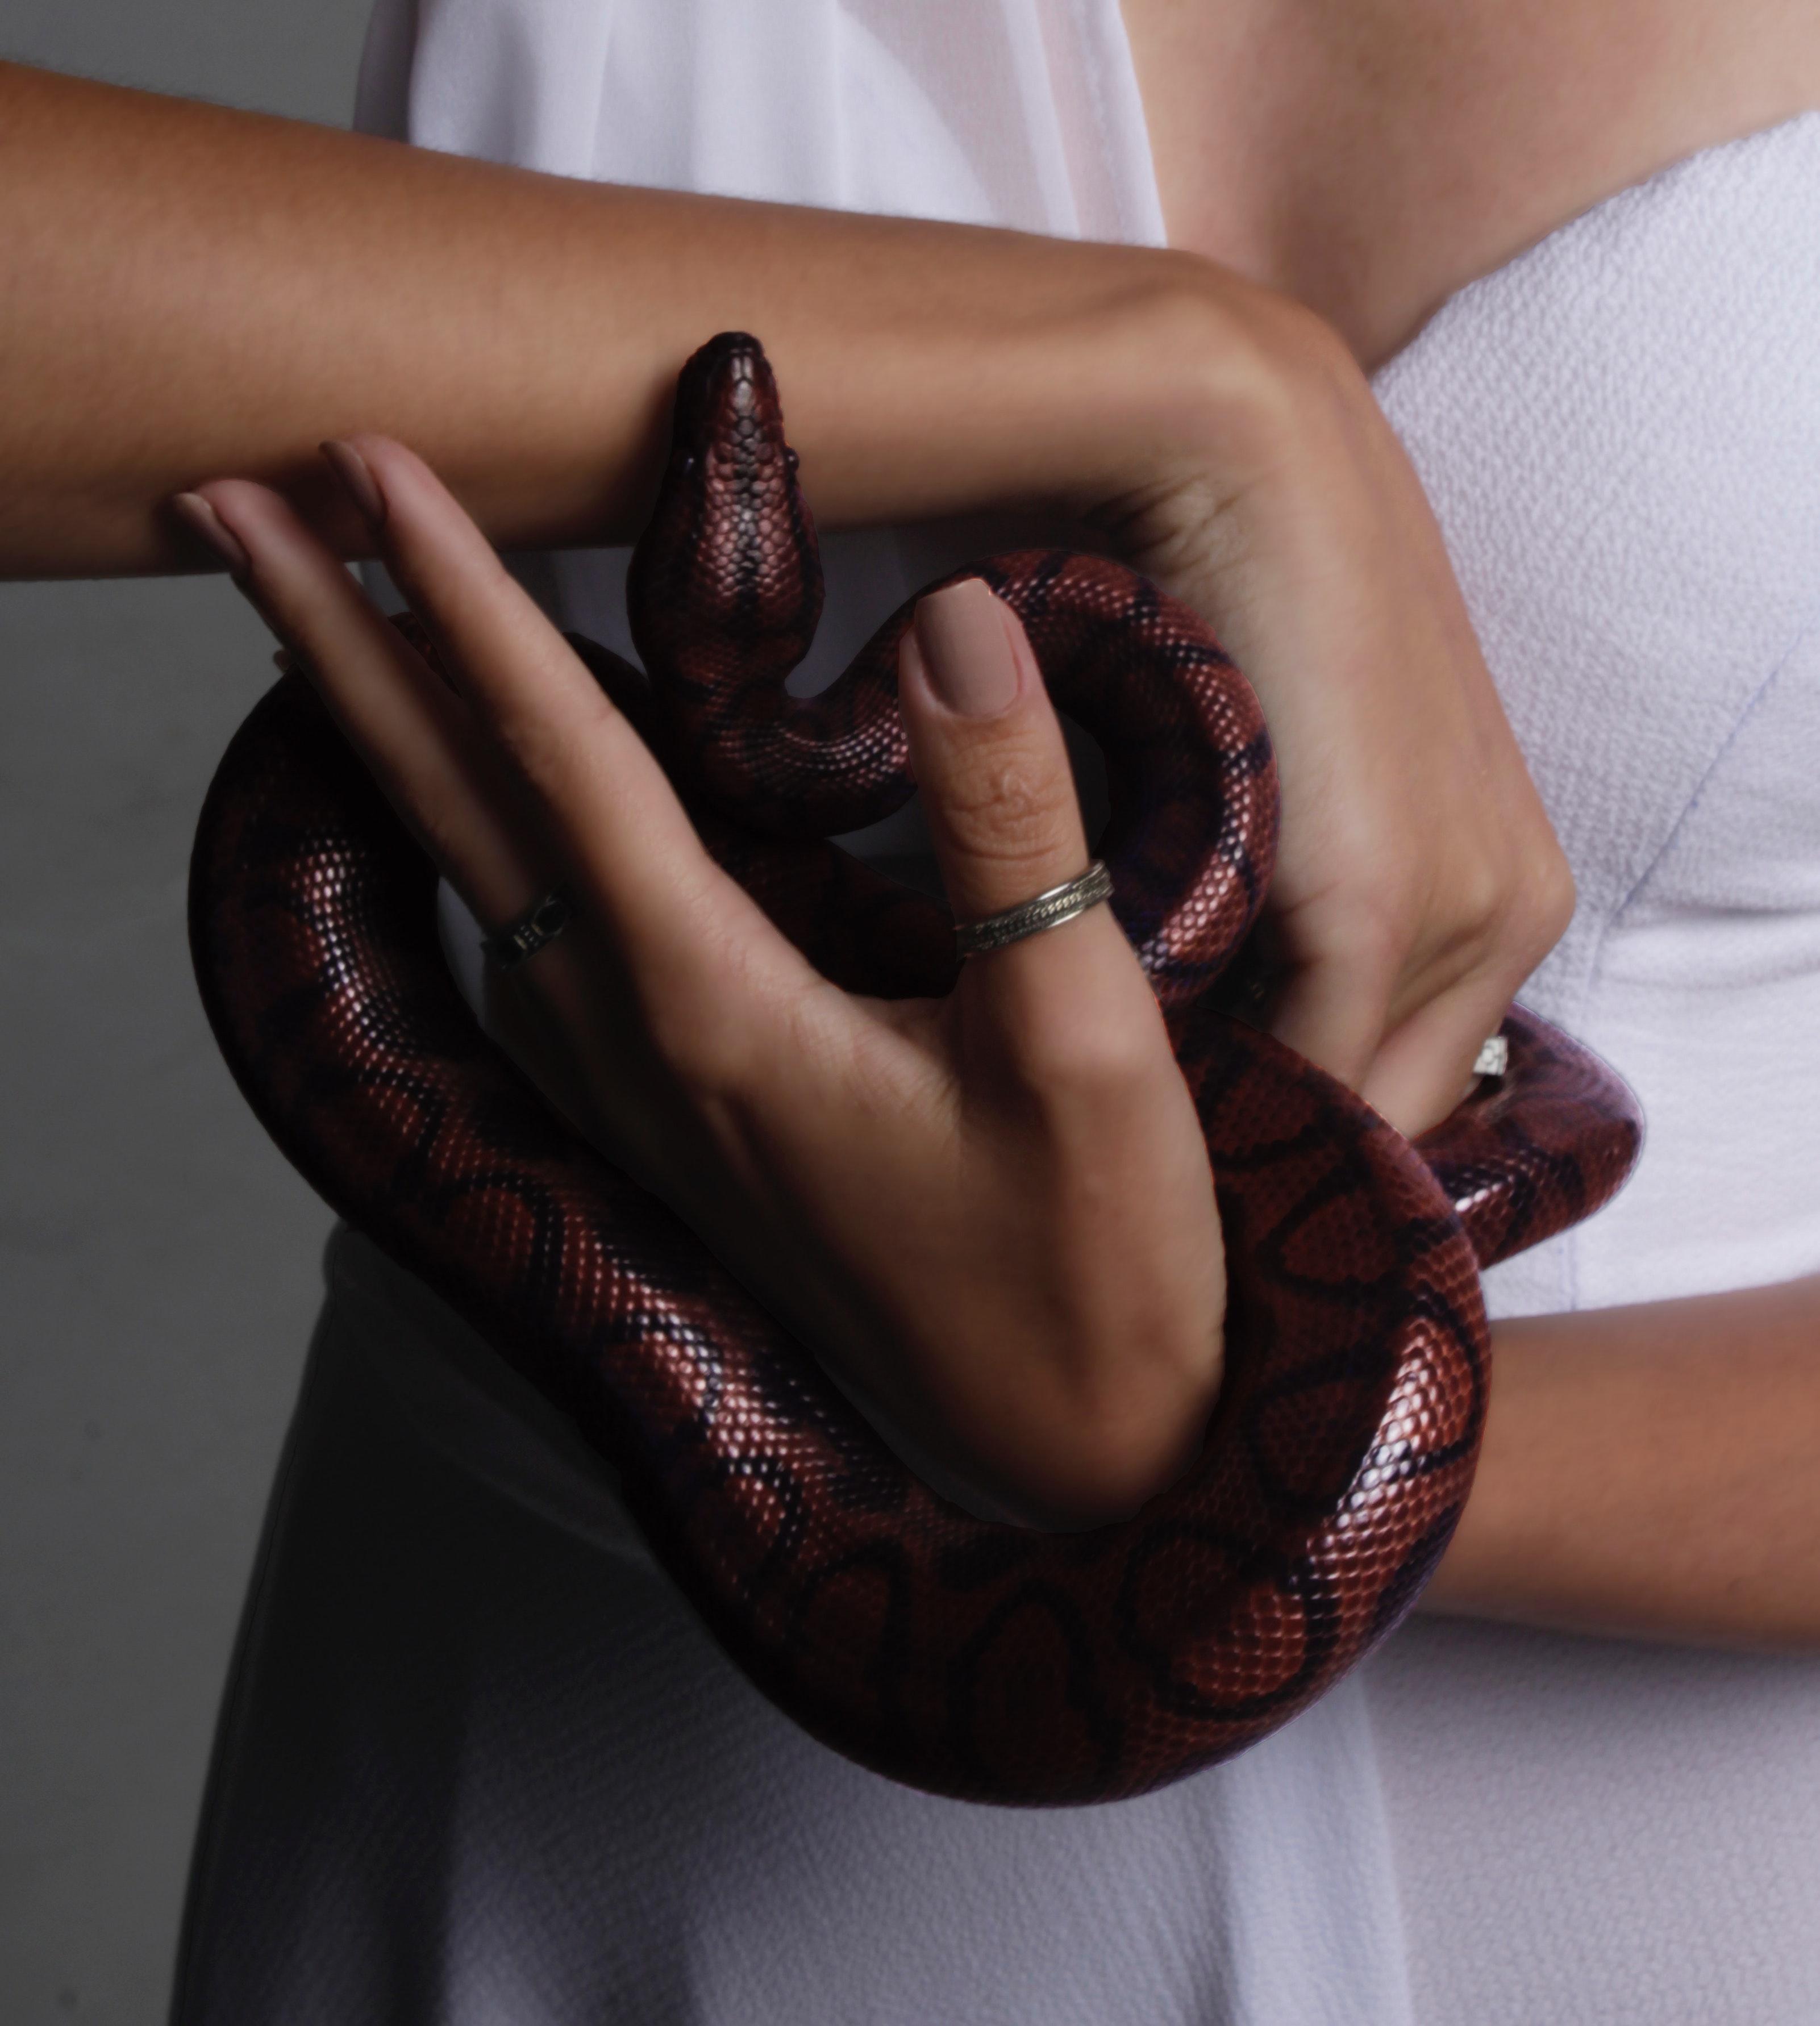 Secrets like snakes